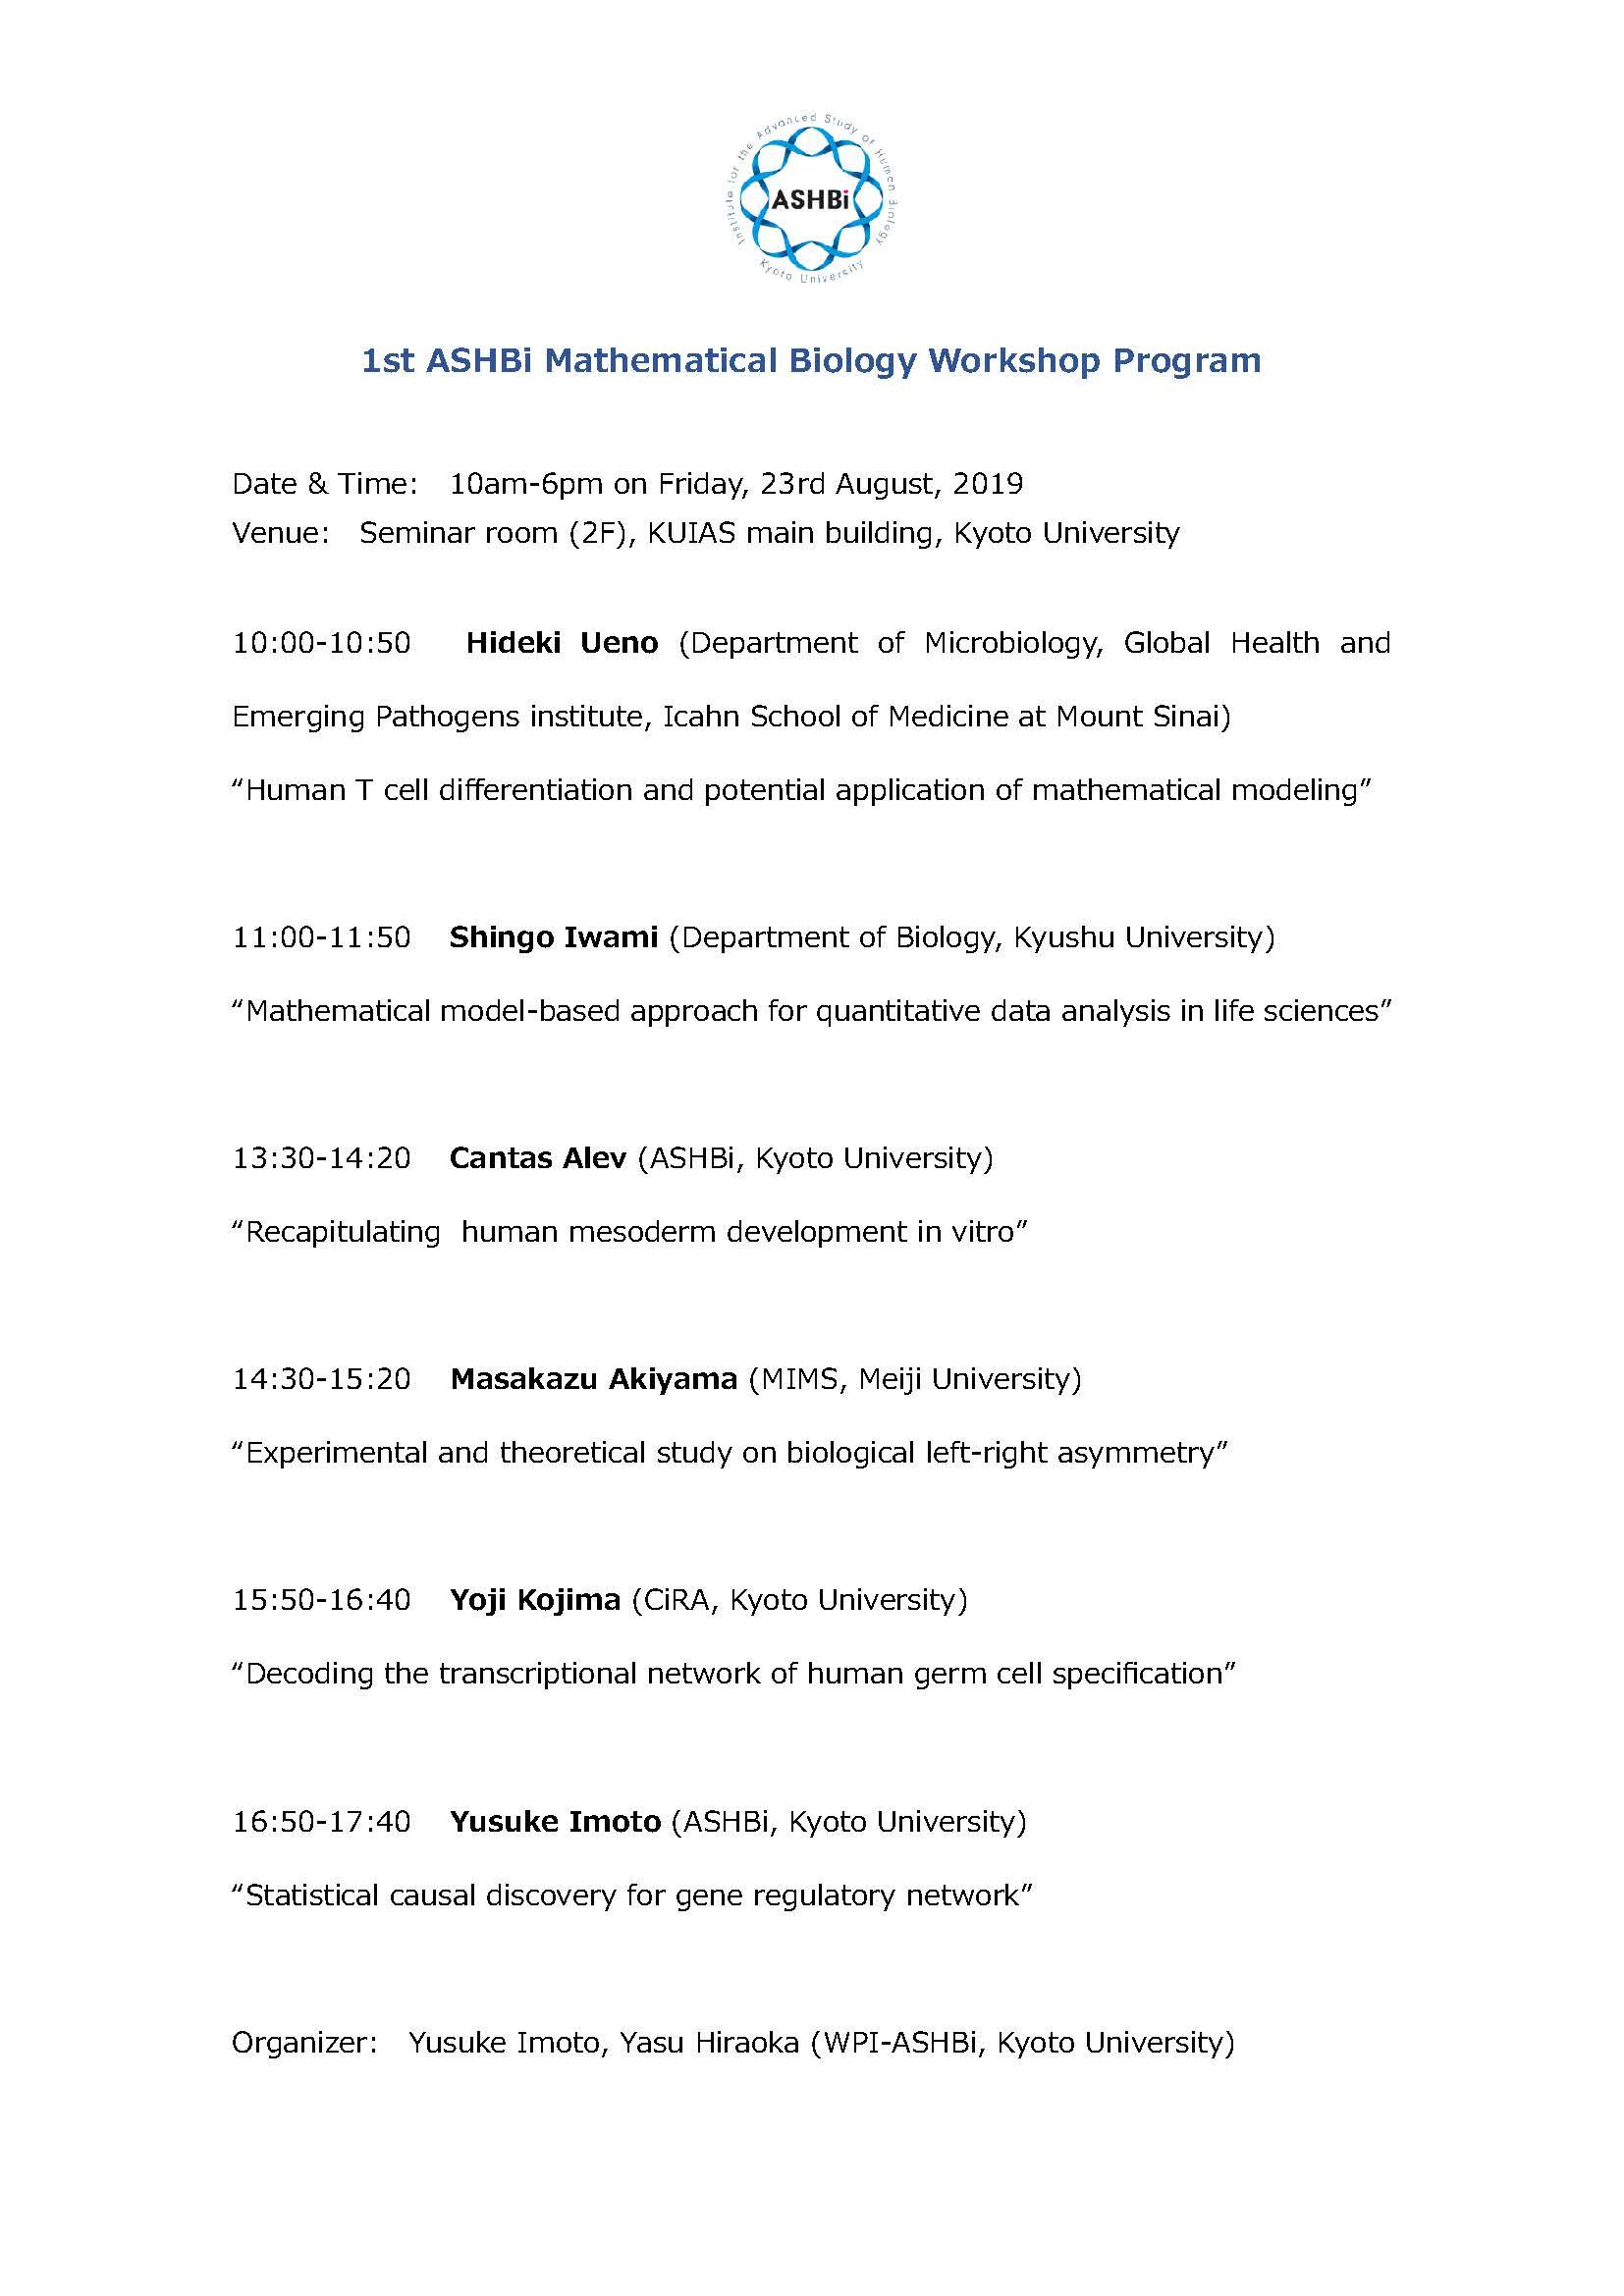 Program of 1st ASHBi Mathematical Biology Workshop